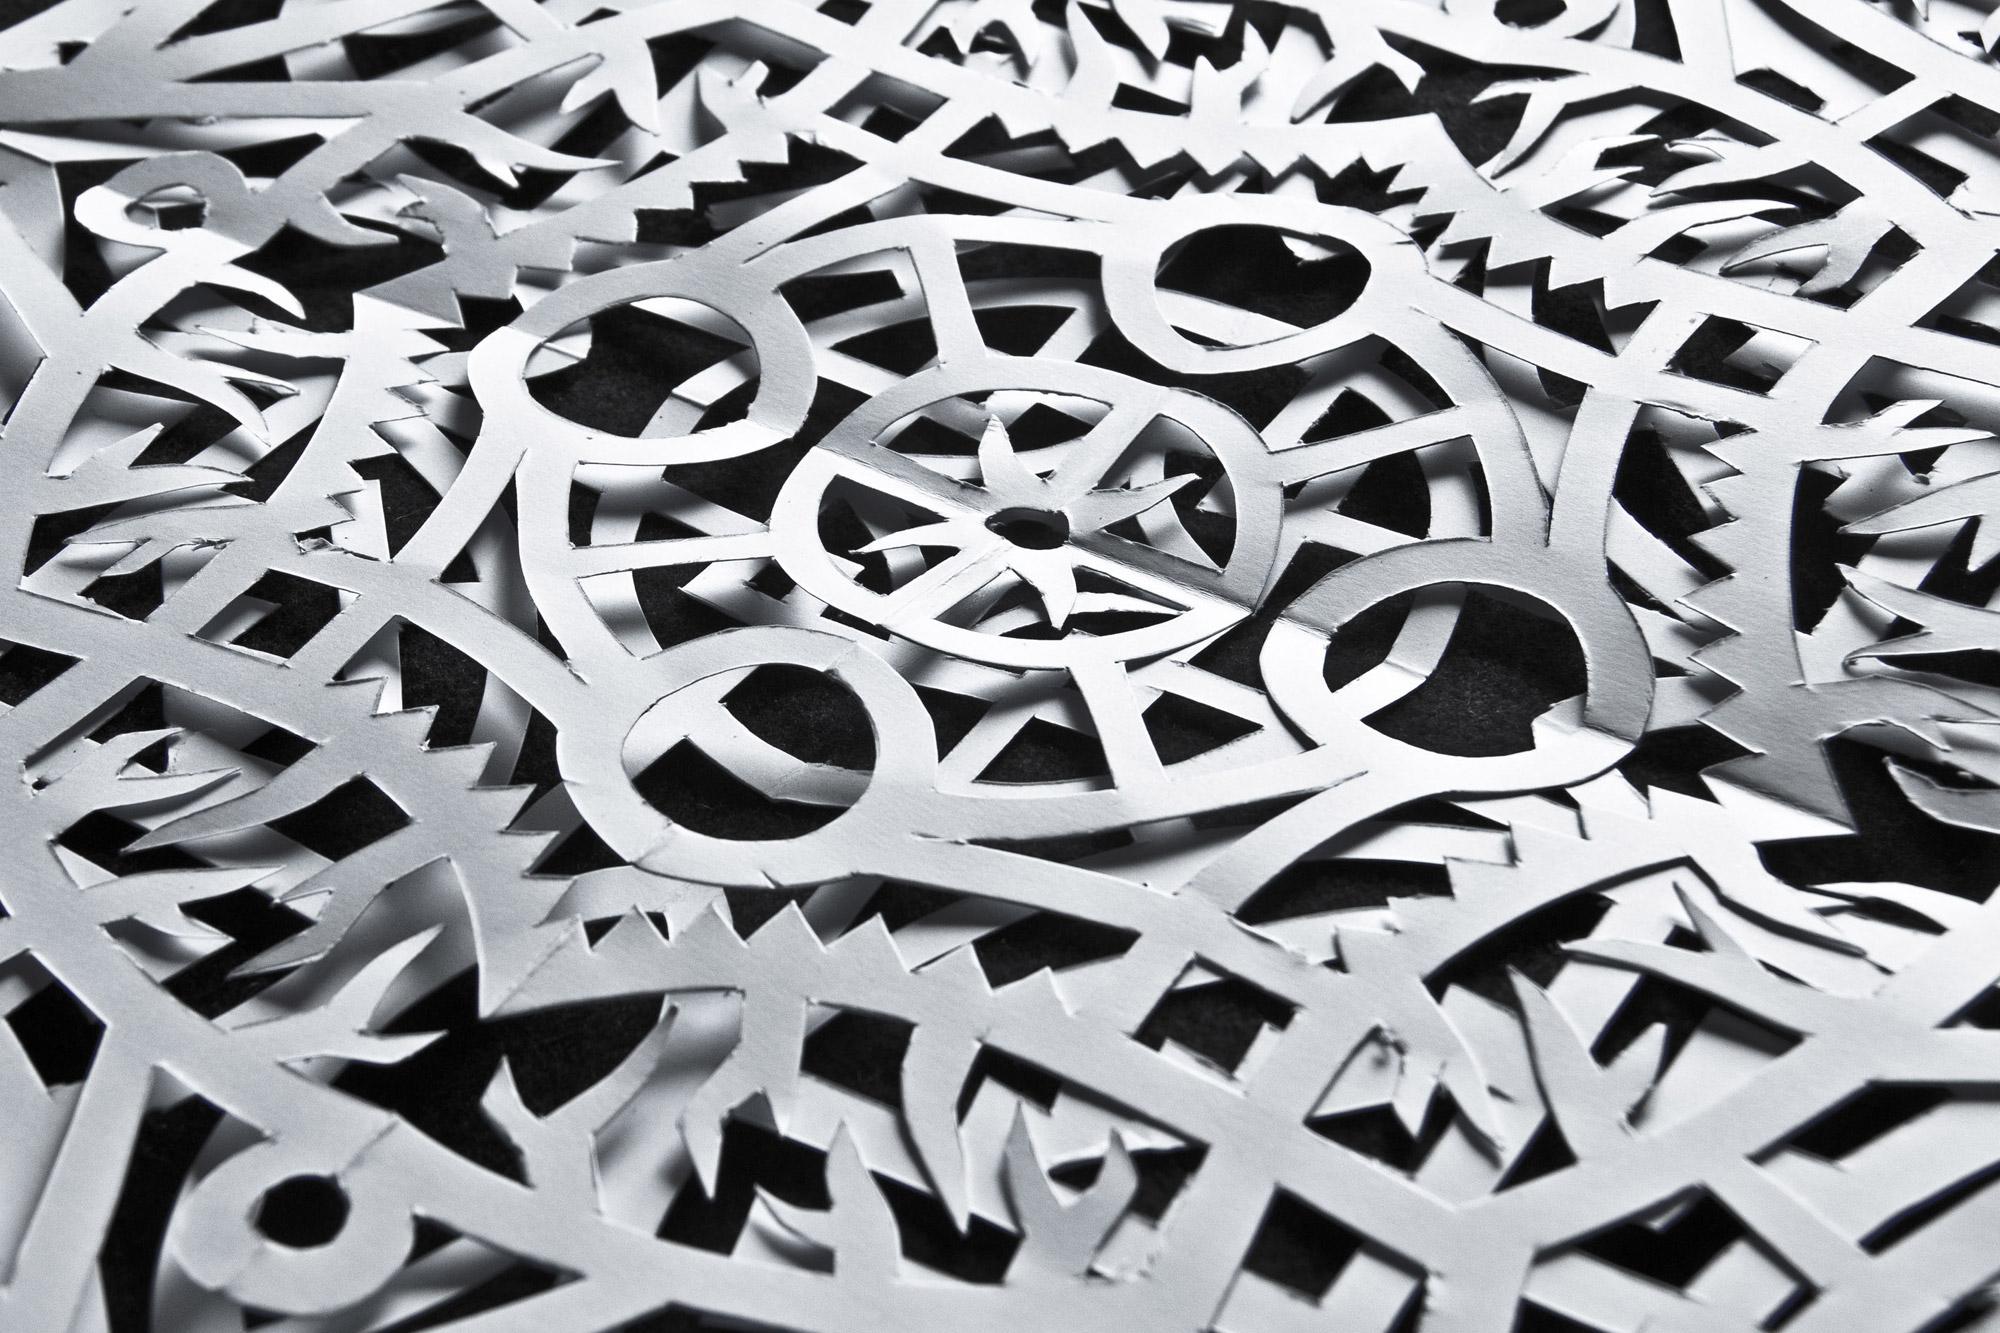 papercutting-workshop7-detail